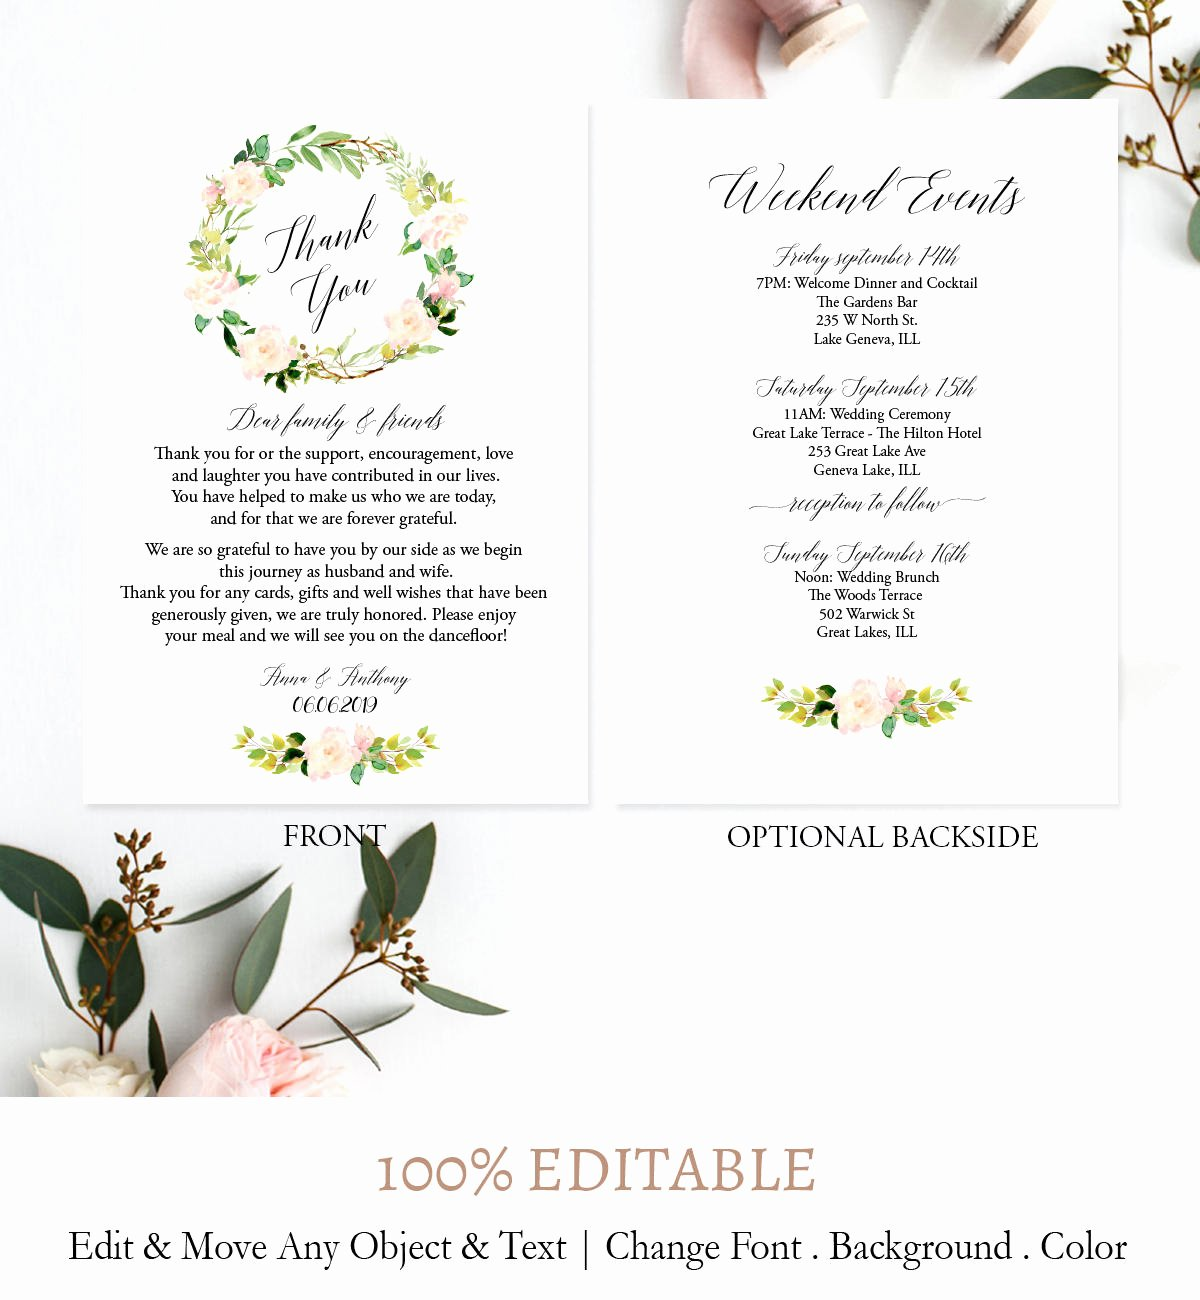 Wedding Weekend Itinerary Template Beautiful Pink Wreath Weekend Itinerary Template Boho Printable